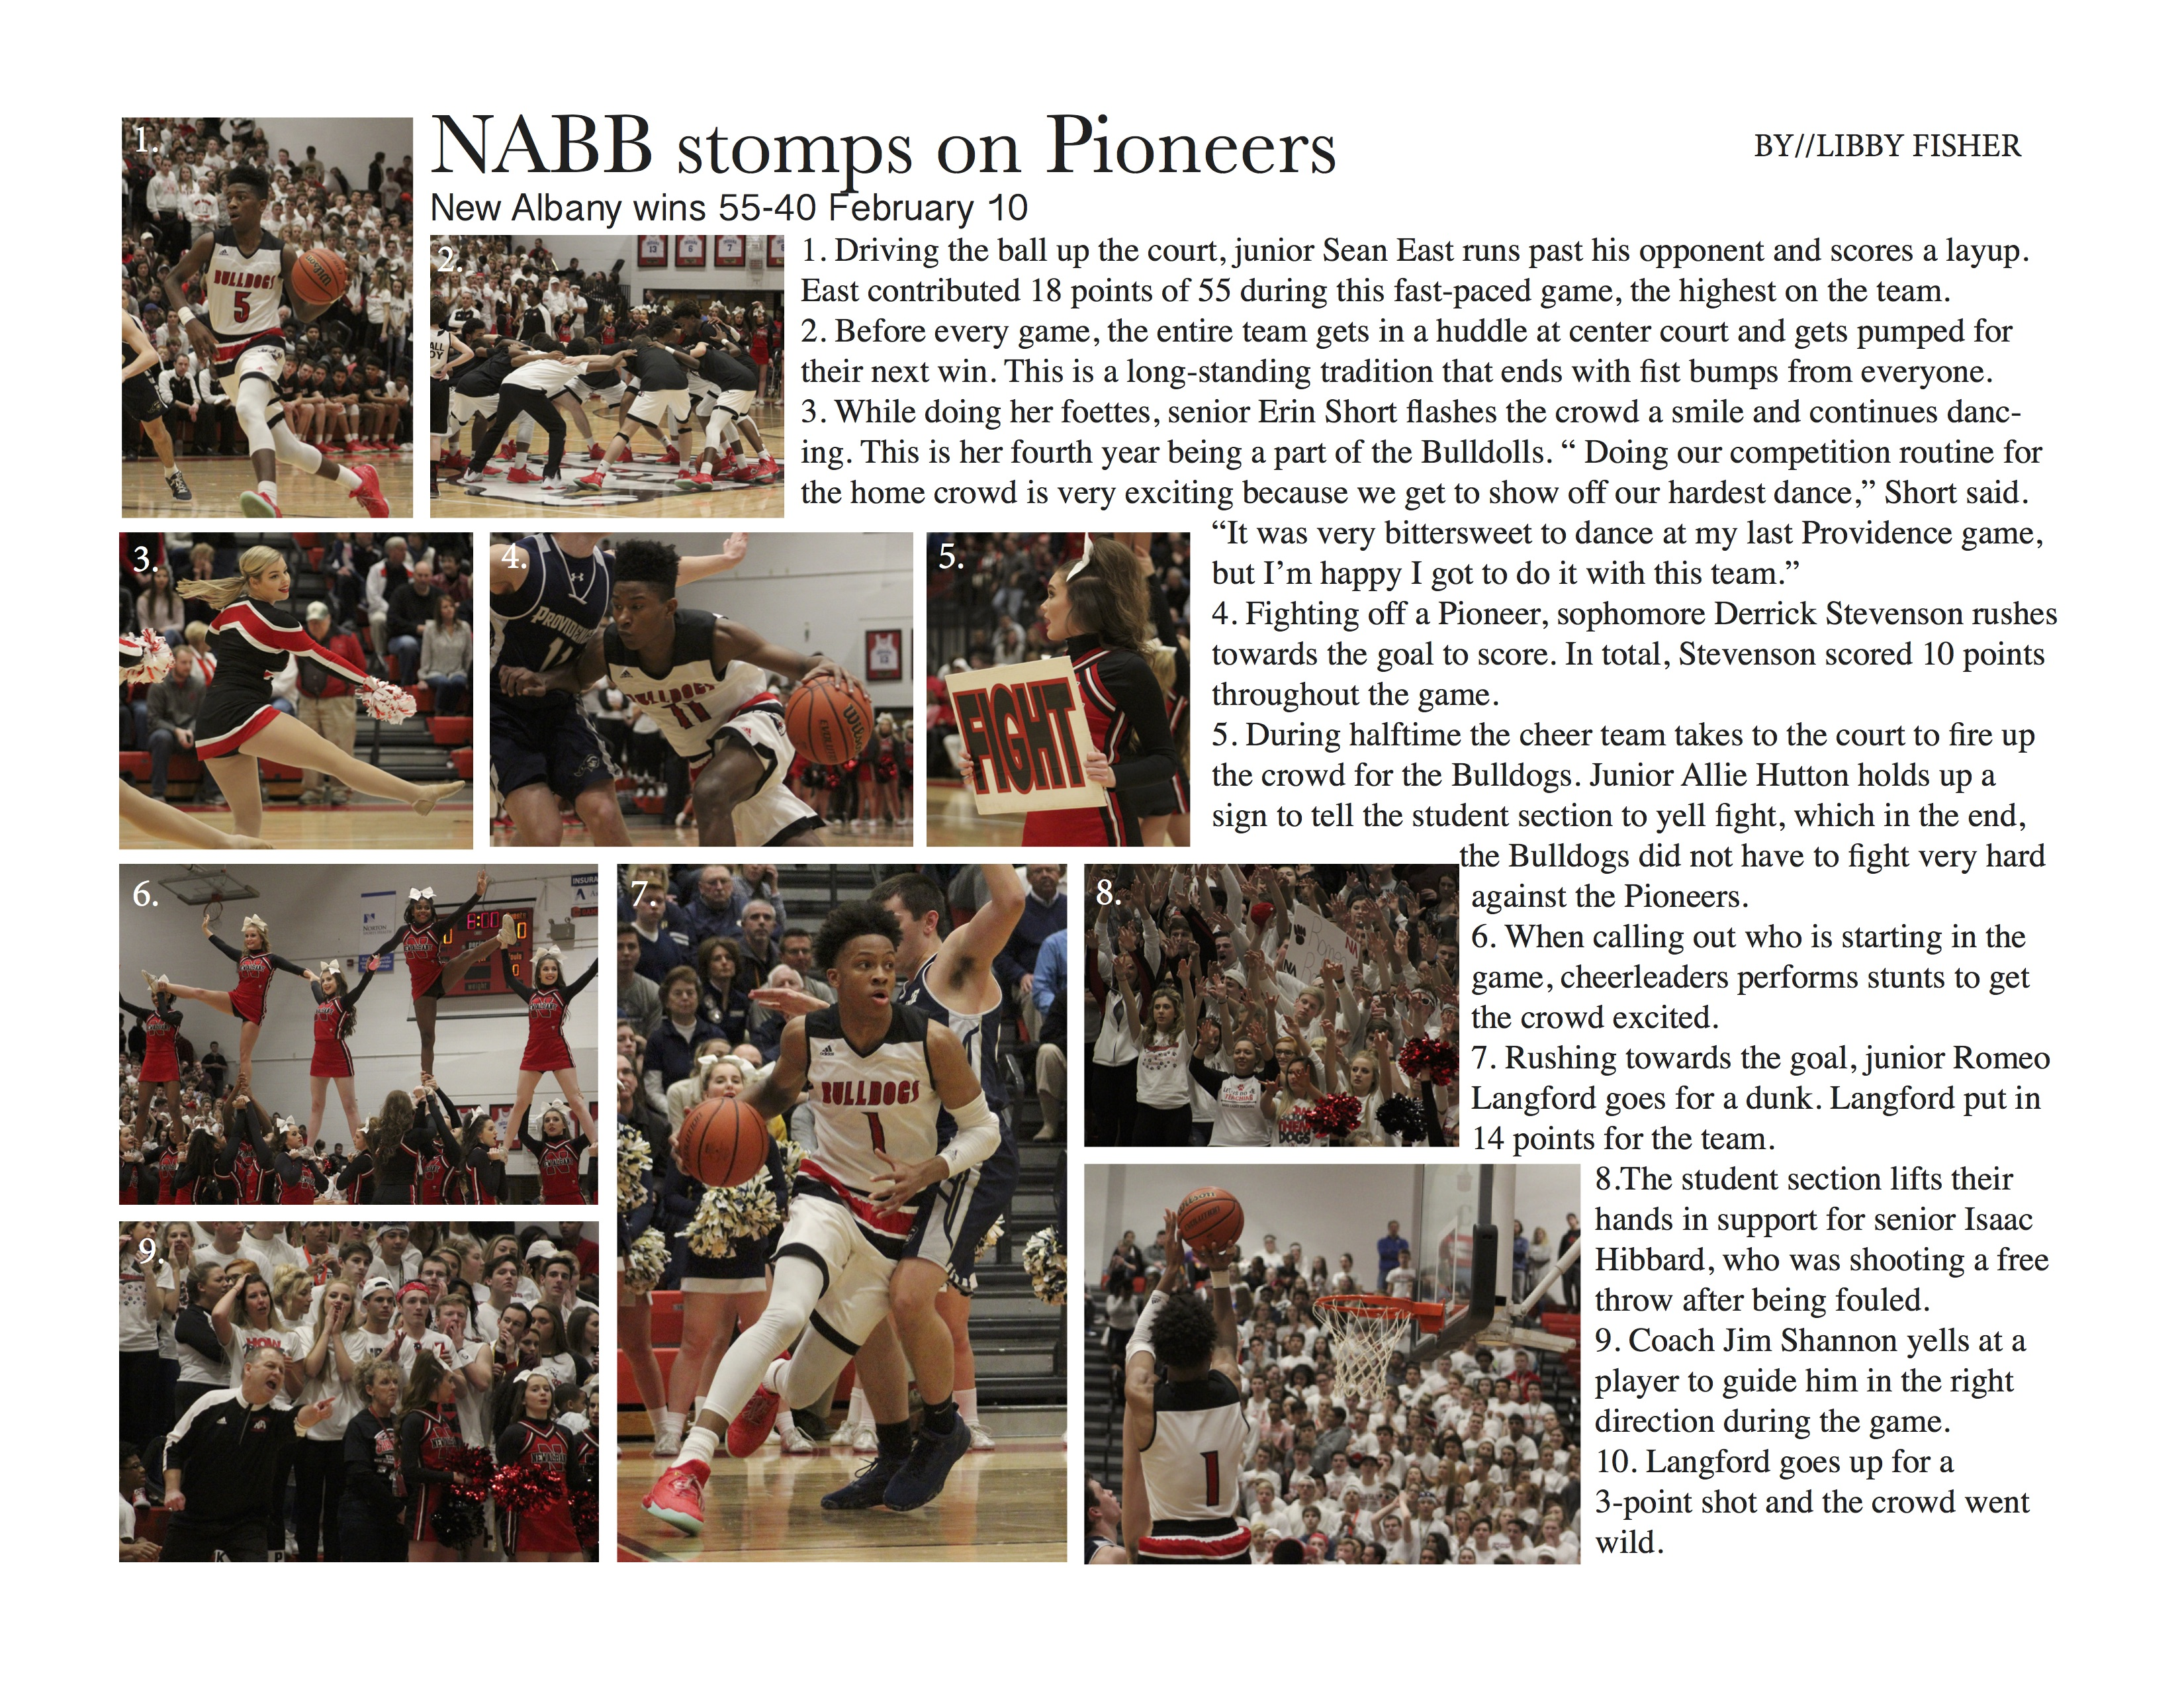 NABB stomps Pioneers